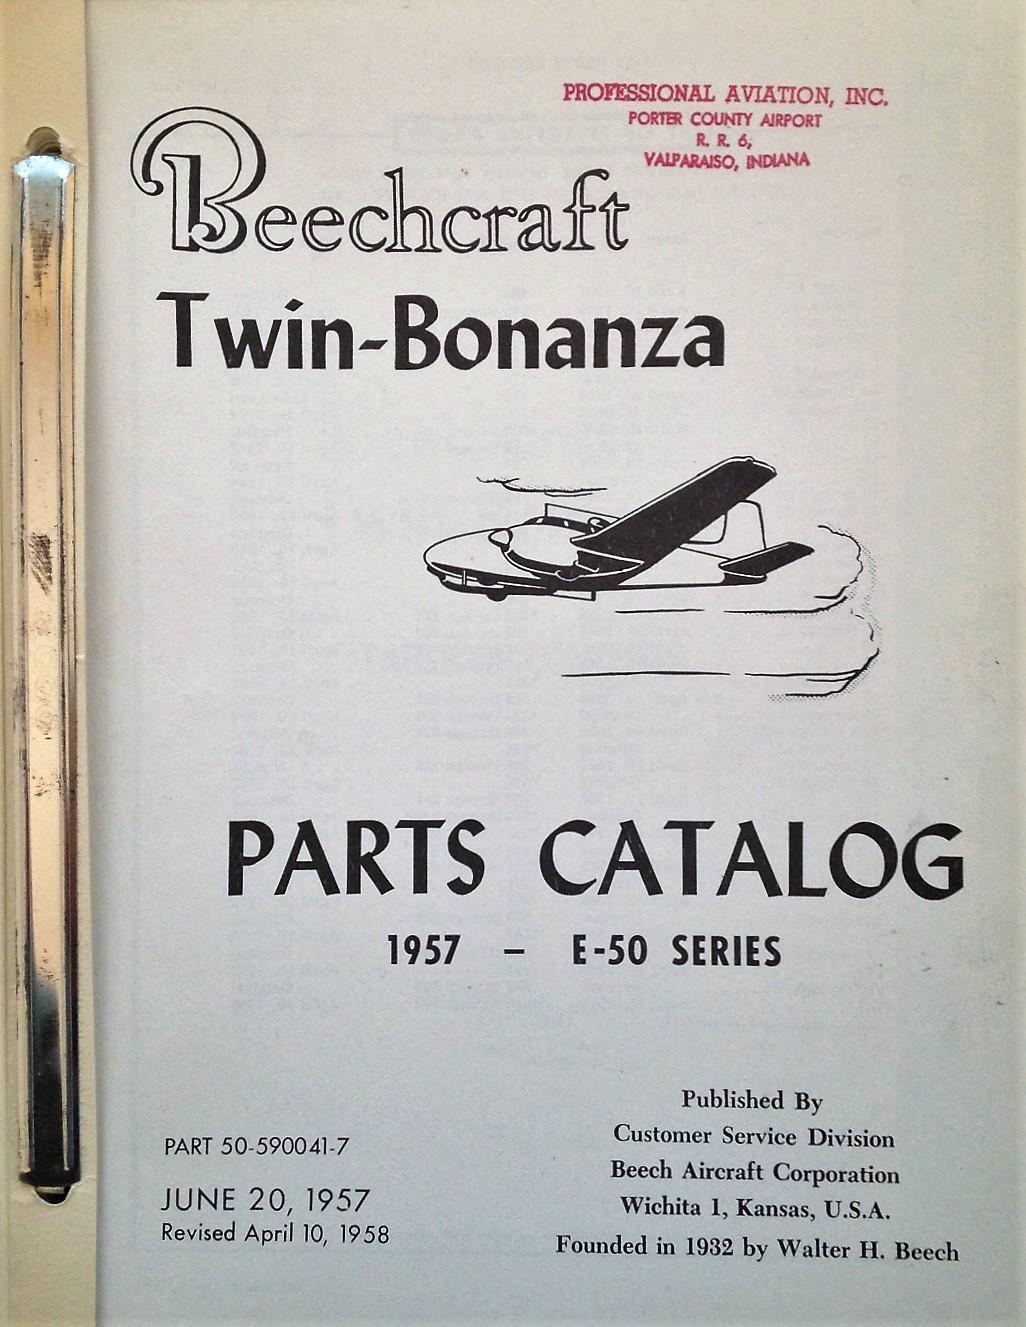 Beechcraft Twin-Bonanza E-50 Parts Catalog